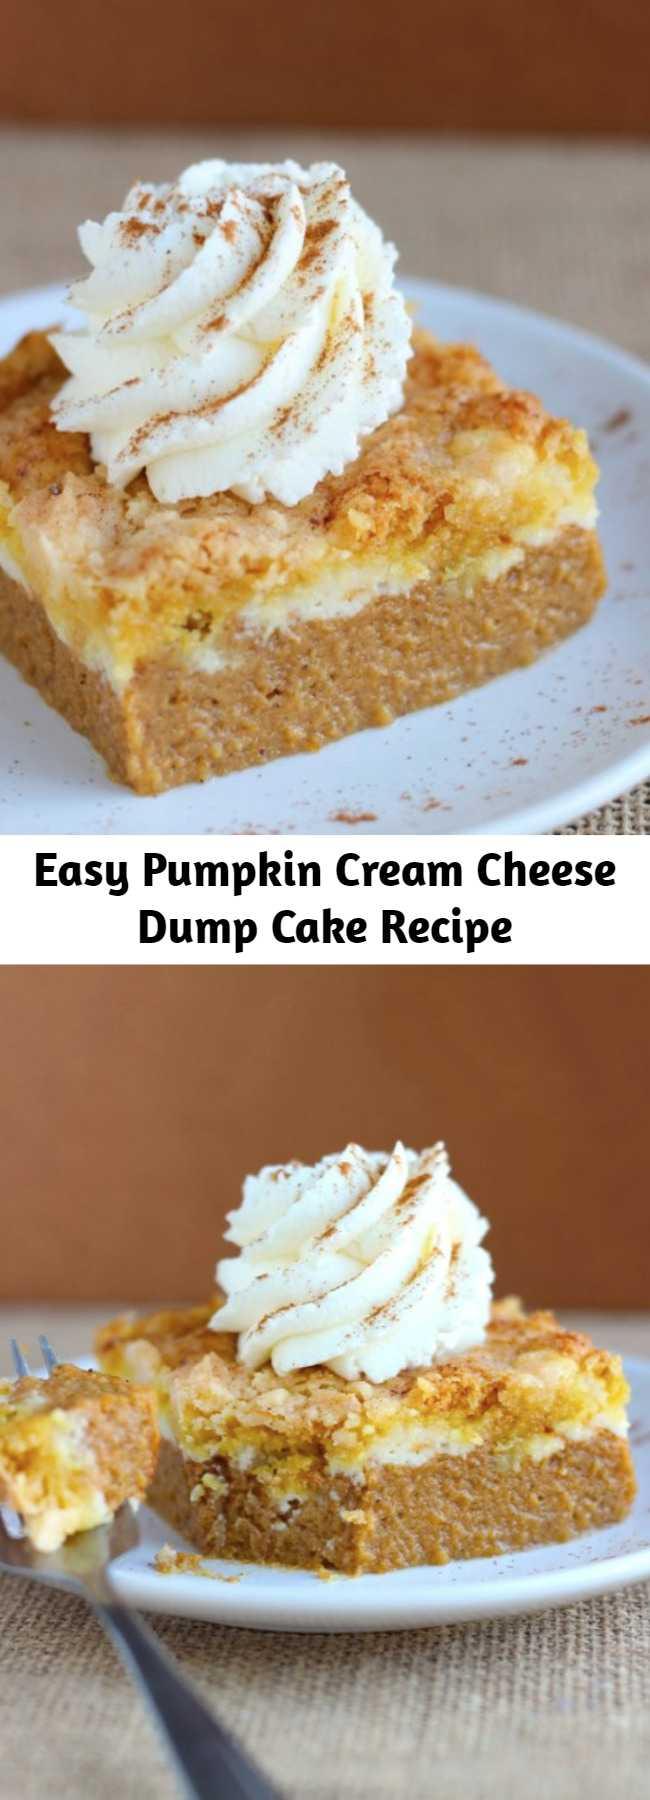 Easy Pumpkin Cream Cheese Dump Cake Recipe - BETTER and way easier than pumpkin pie! This Pumpkin Cream Cheese Dump Cake is the best way to serve pumpkin pie to a crowd!